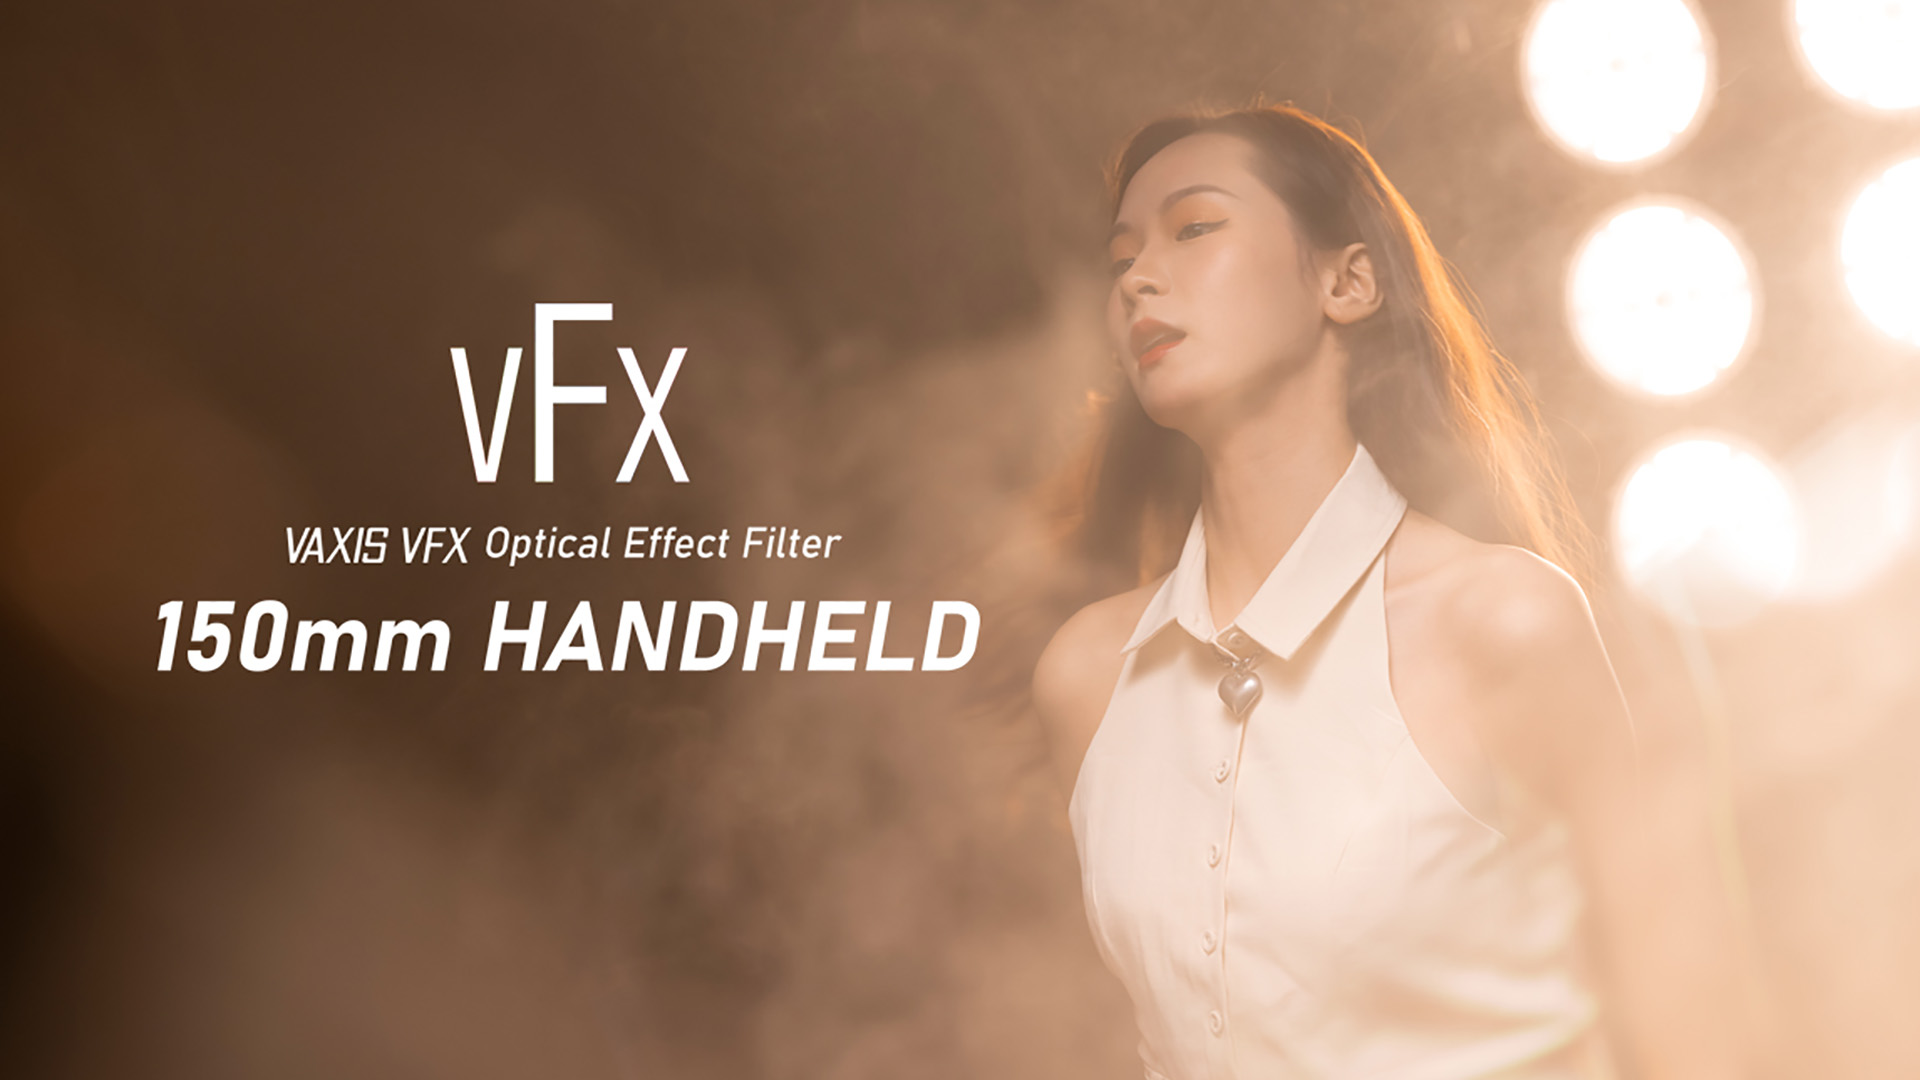 VAXIS威固丨梦之所触—VFX 150mm手持特效